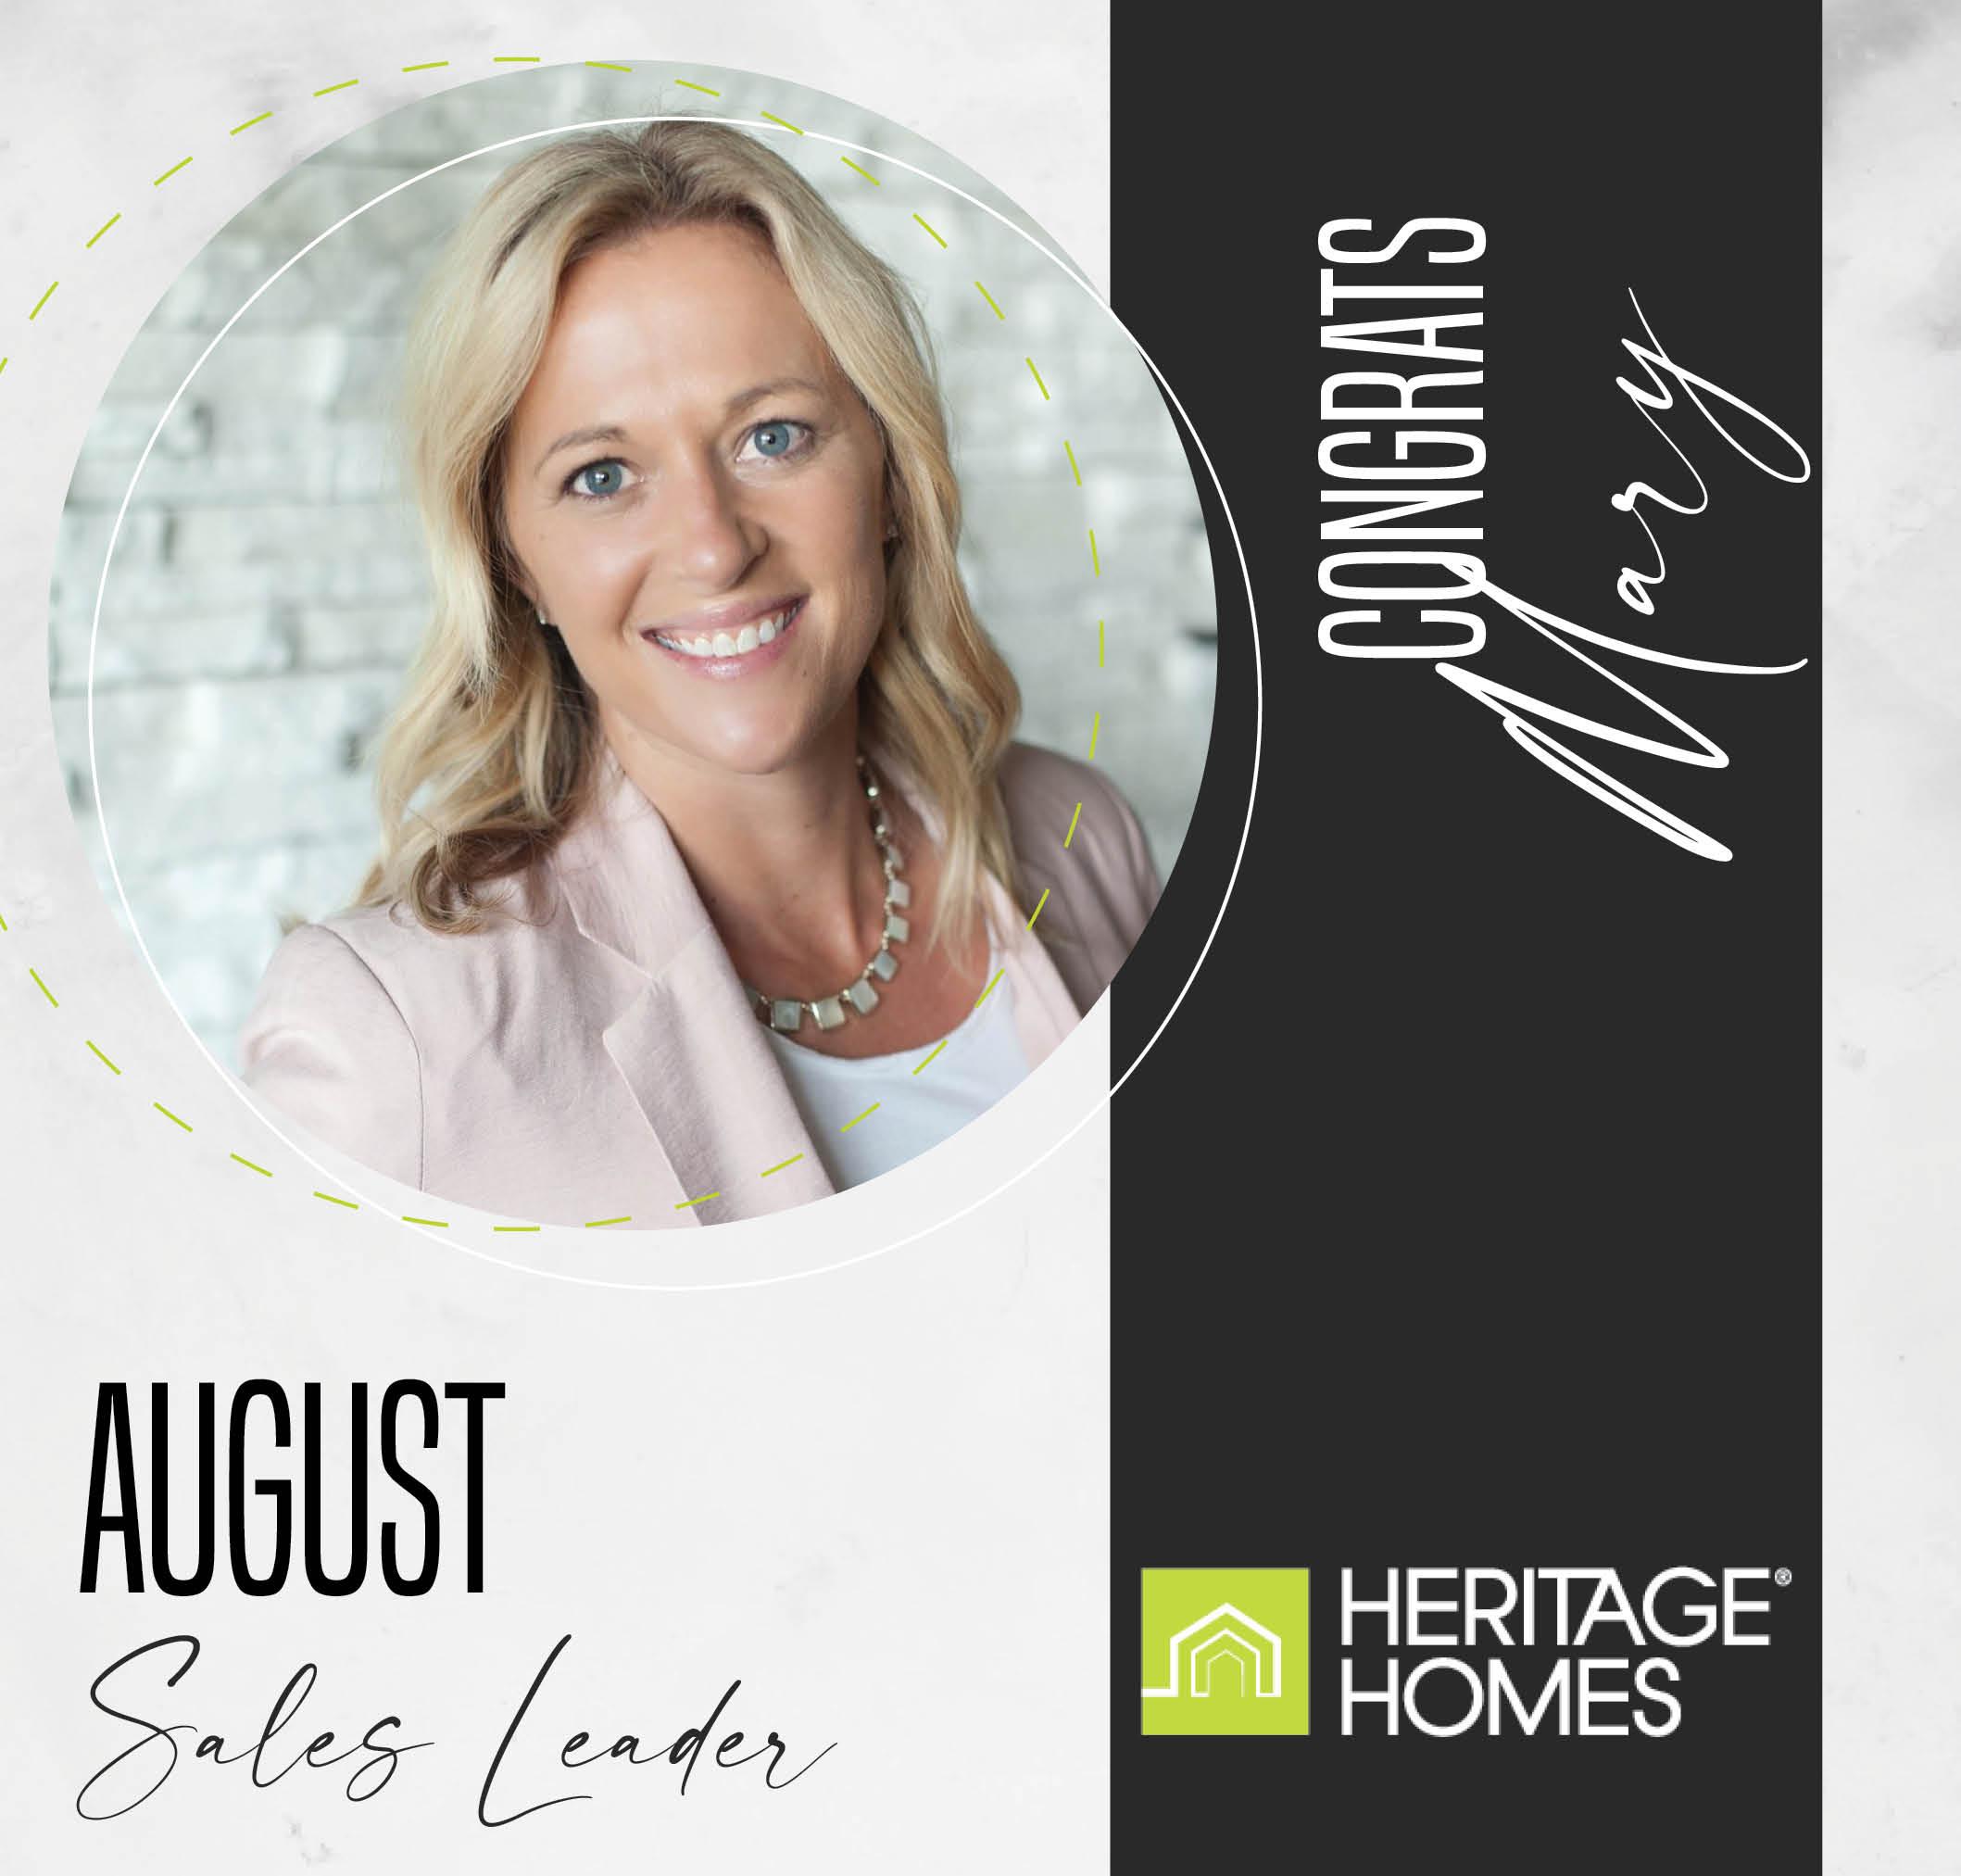 August Sales Leader – Mary Klabo